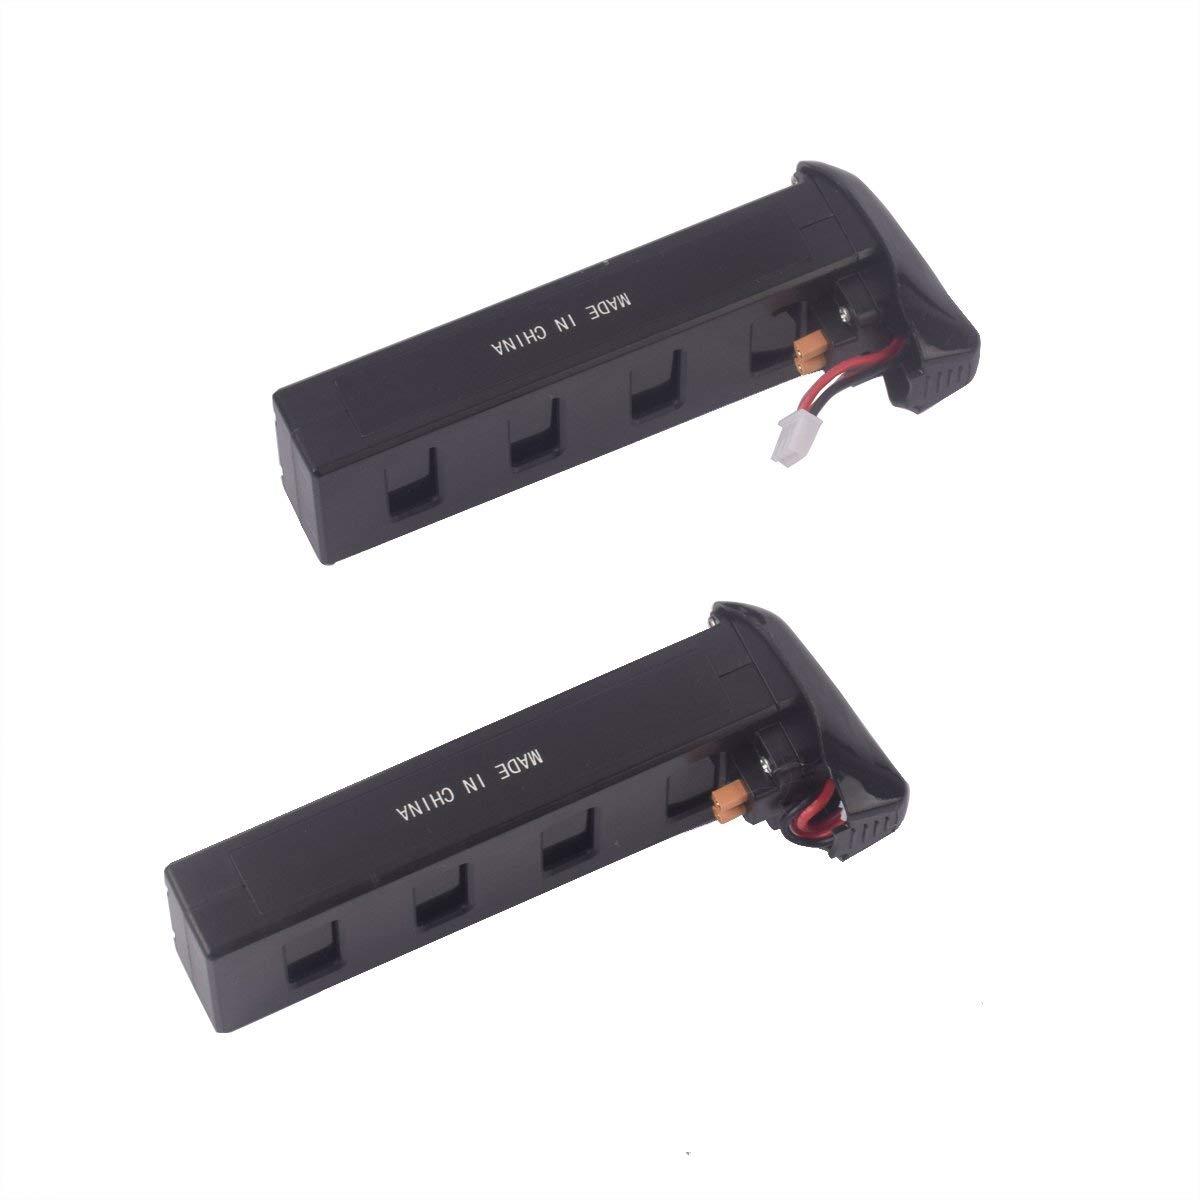 YouCute 2pcs 7.4V 1800mAh Battery for Bugs 3 Mjx B3 Force1 F100,Contixo F17 RC quadcopter drone spare parts 2PCS 1800mAh batteries